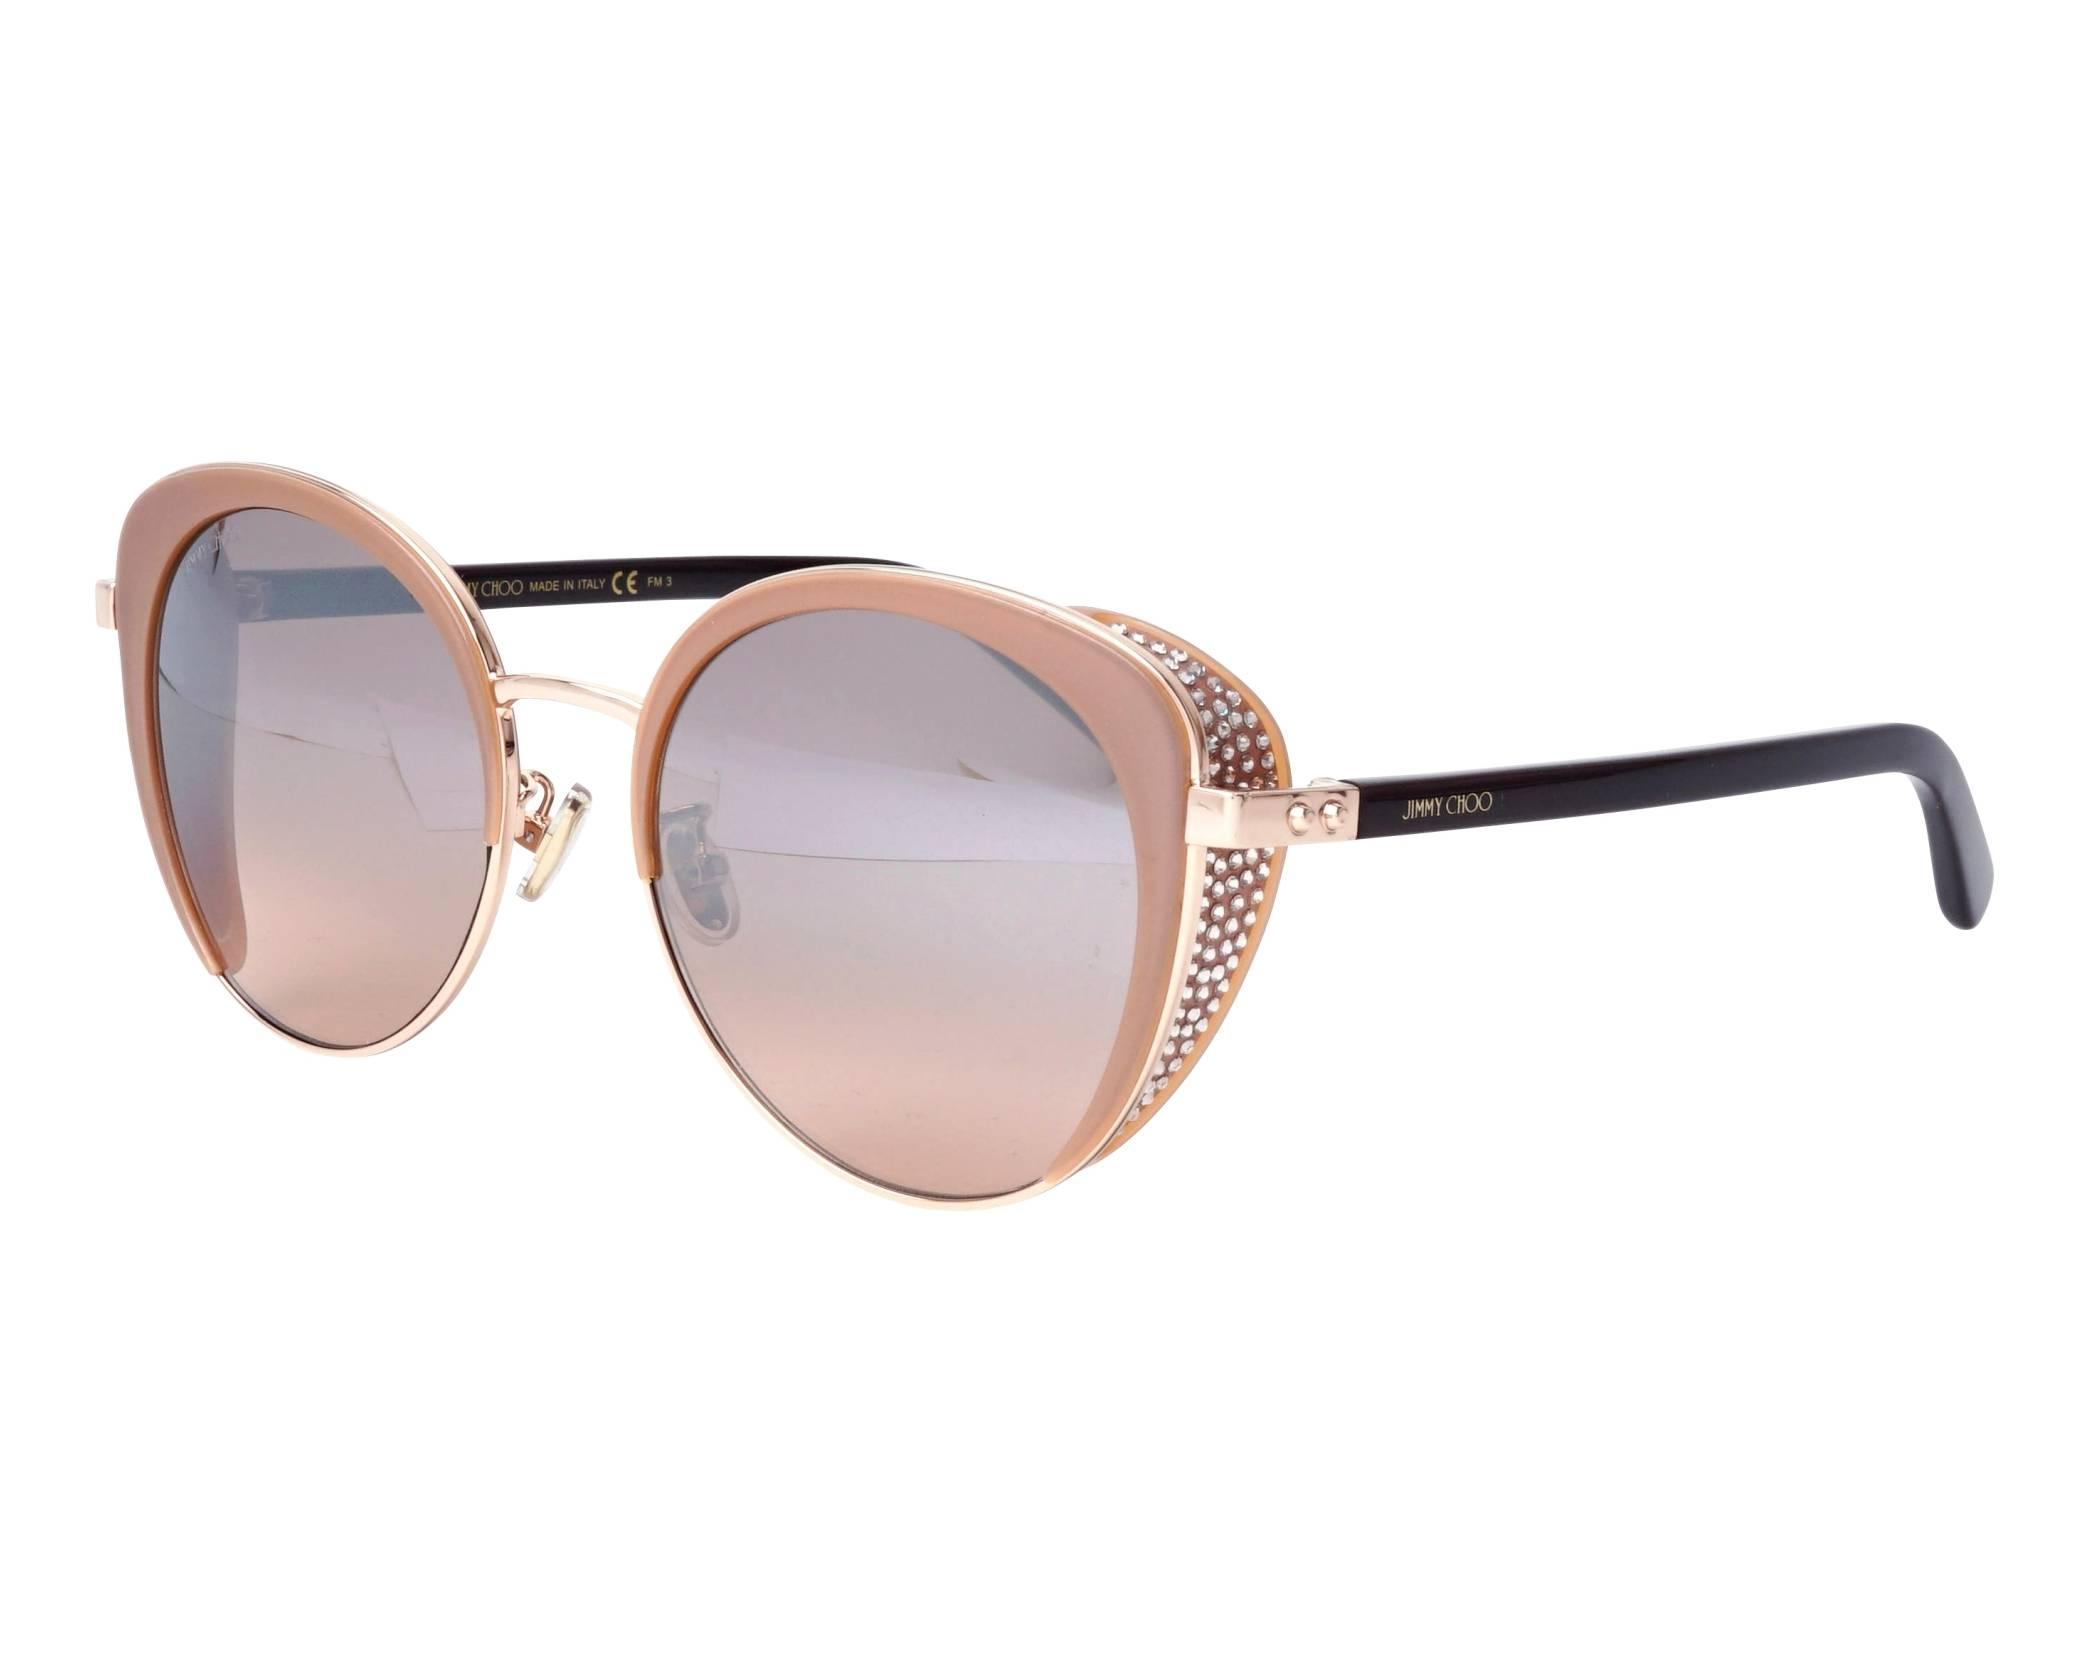 Jimmy Choo GABBY/F/S Asian Fit 2M2 Sunglasses Black Gold